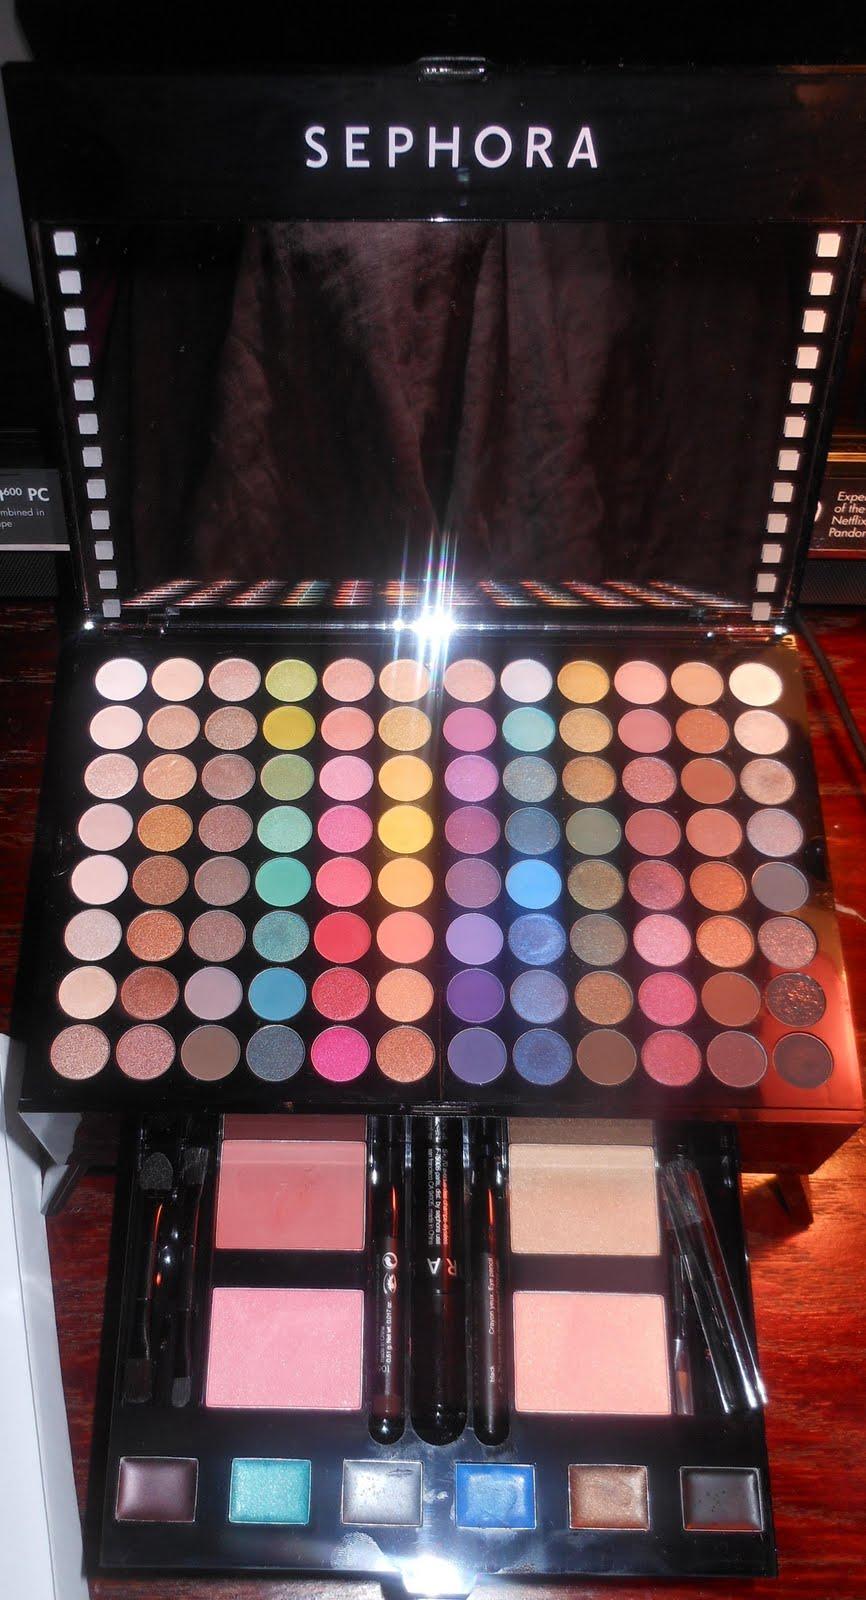 Sephora Makeup | Sephora Makeup Academy Palette Limited